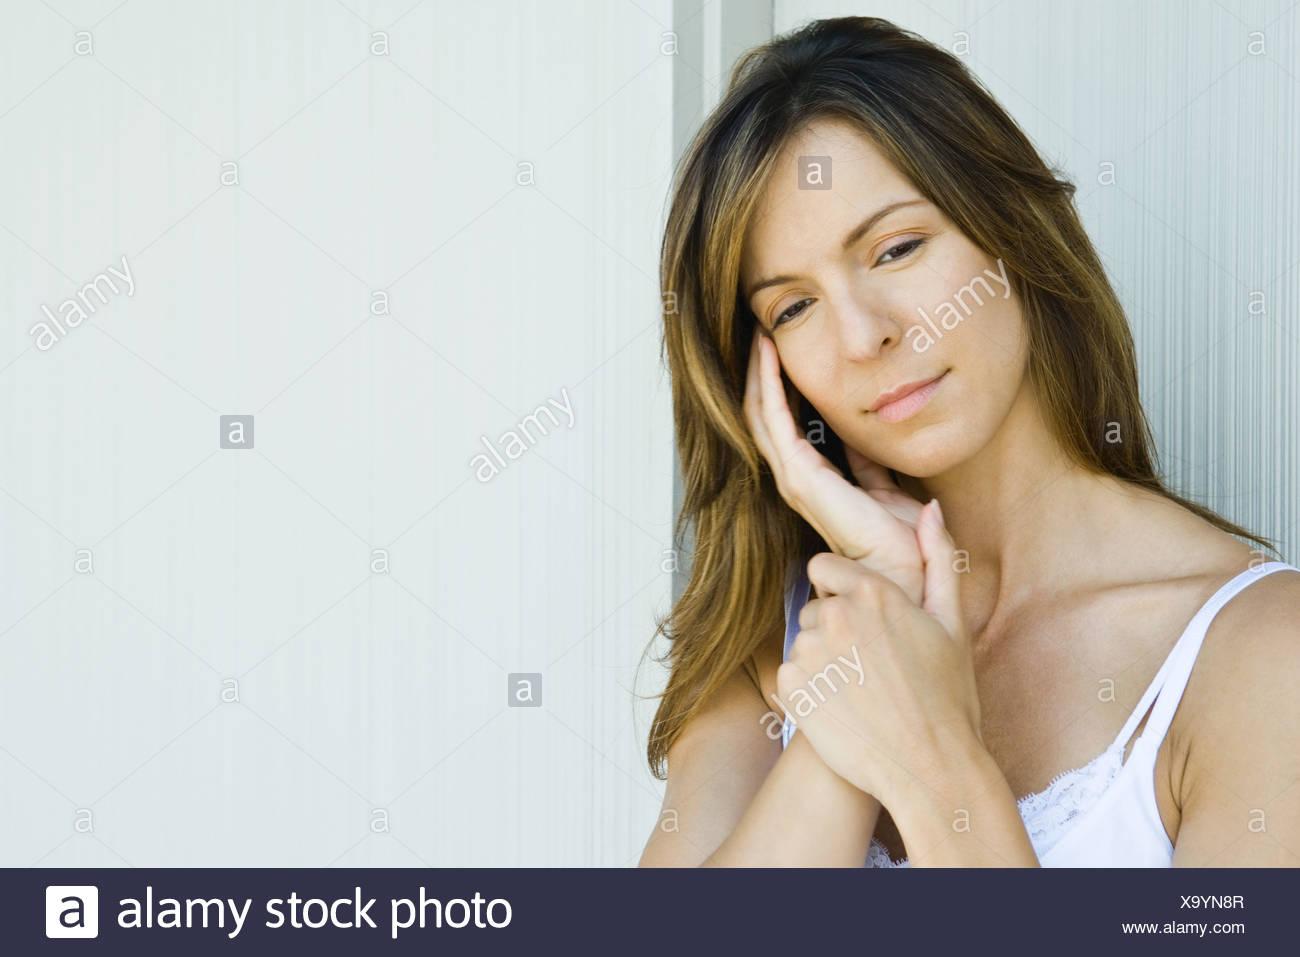 Frau hielt Kopf, Blick nach unten Stockbild